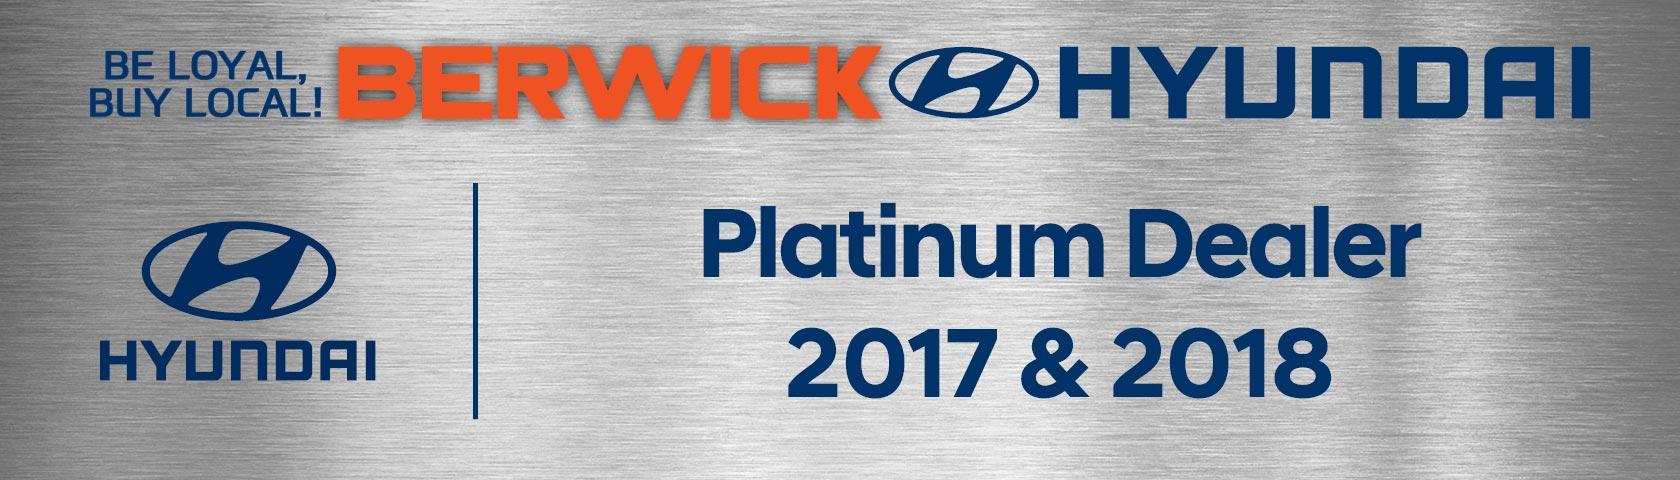 HyundaiBerwick-PlatnuimDealerhpb